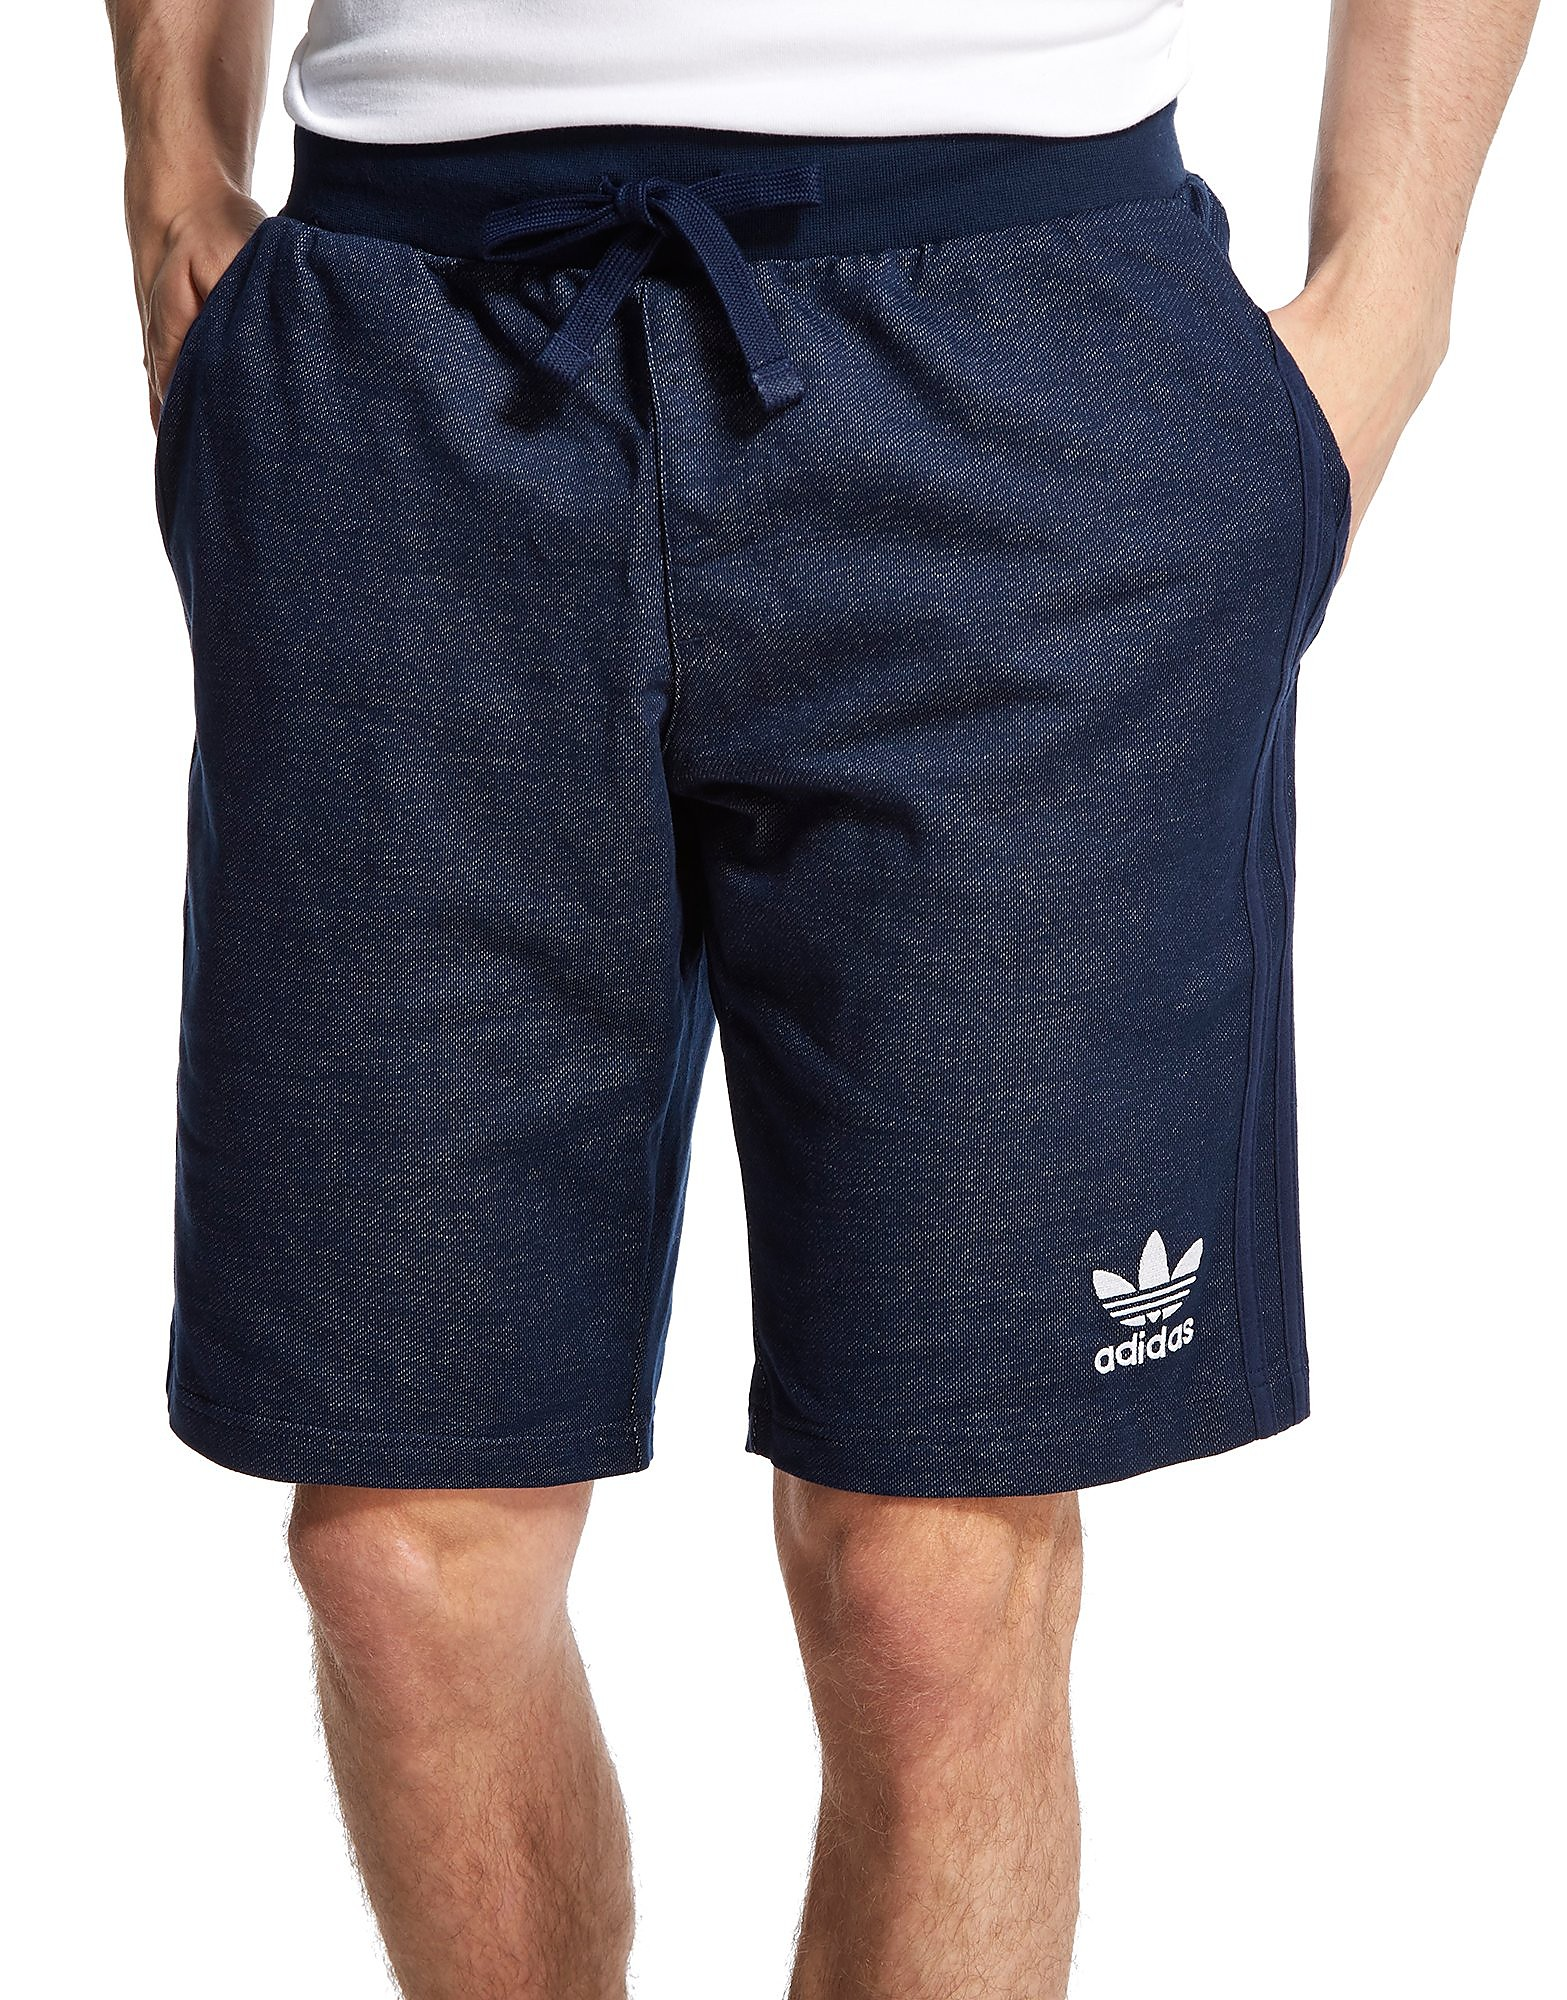 adidas Originals Trefoil Lifestyle Shorts